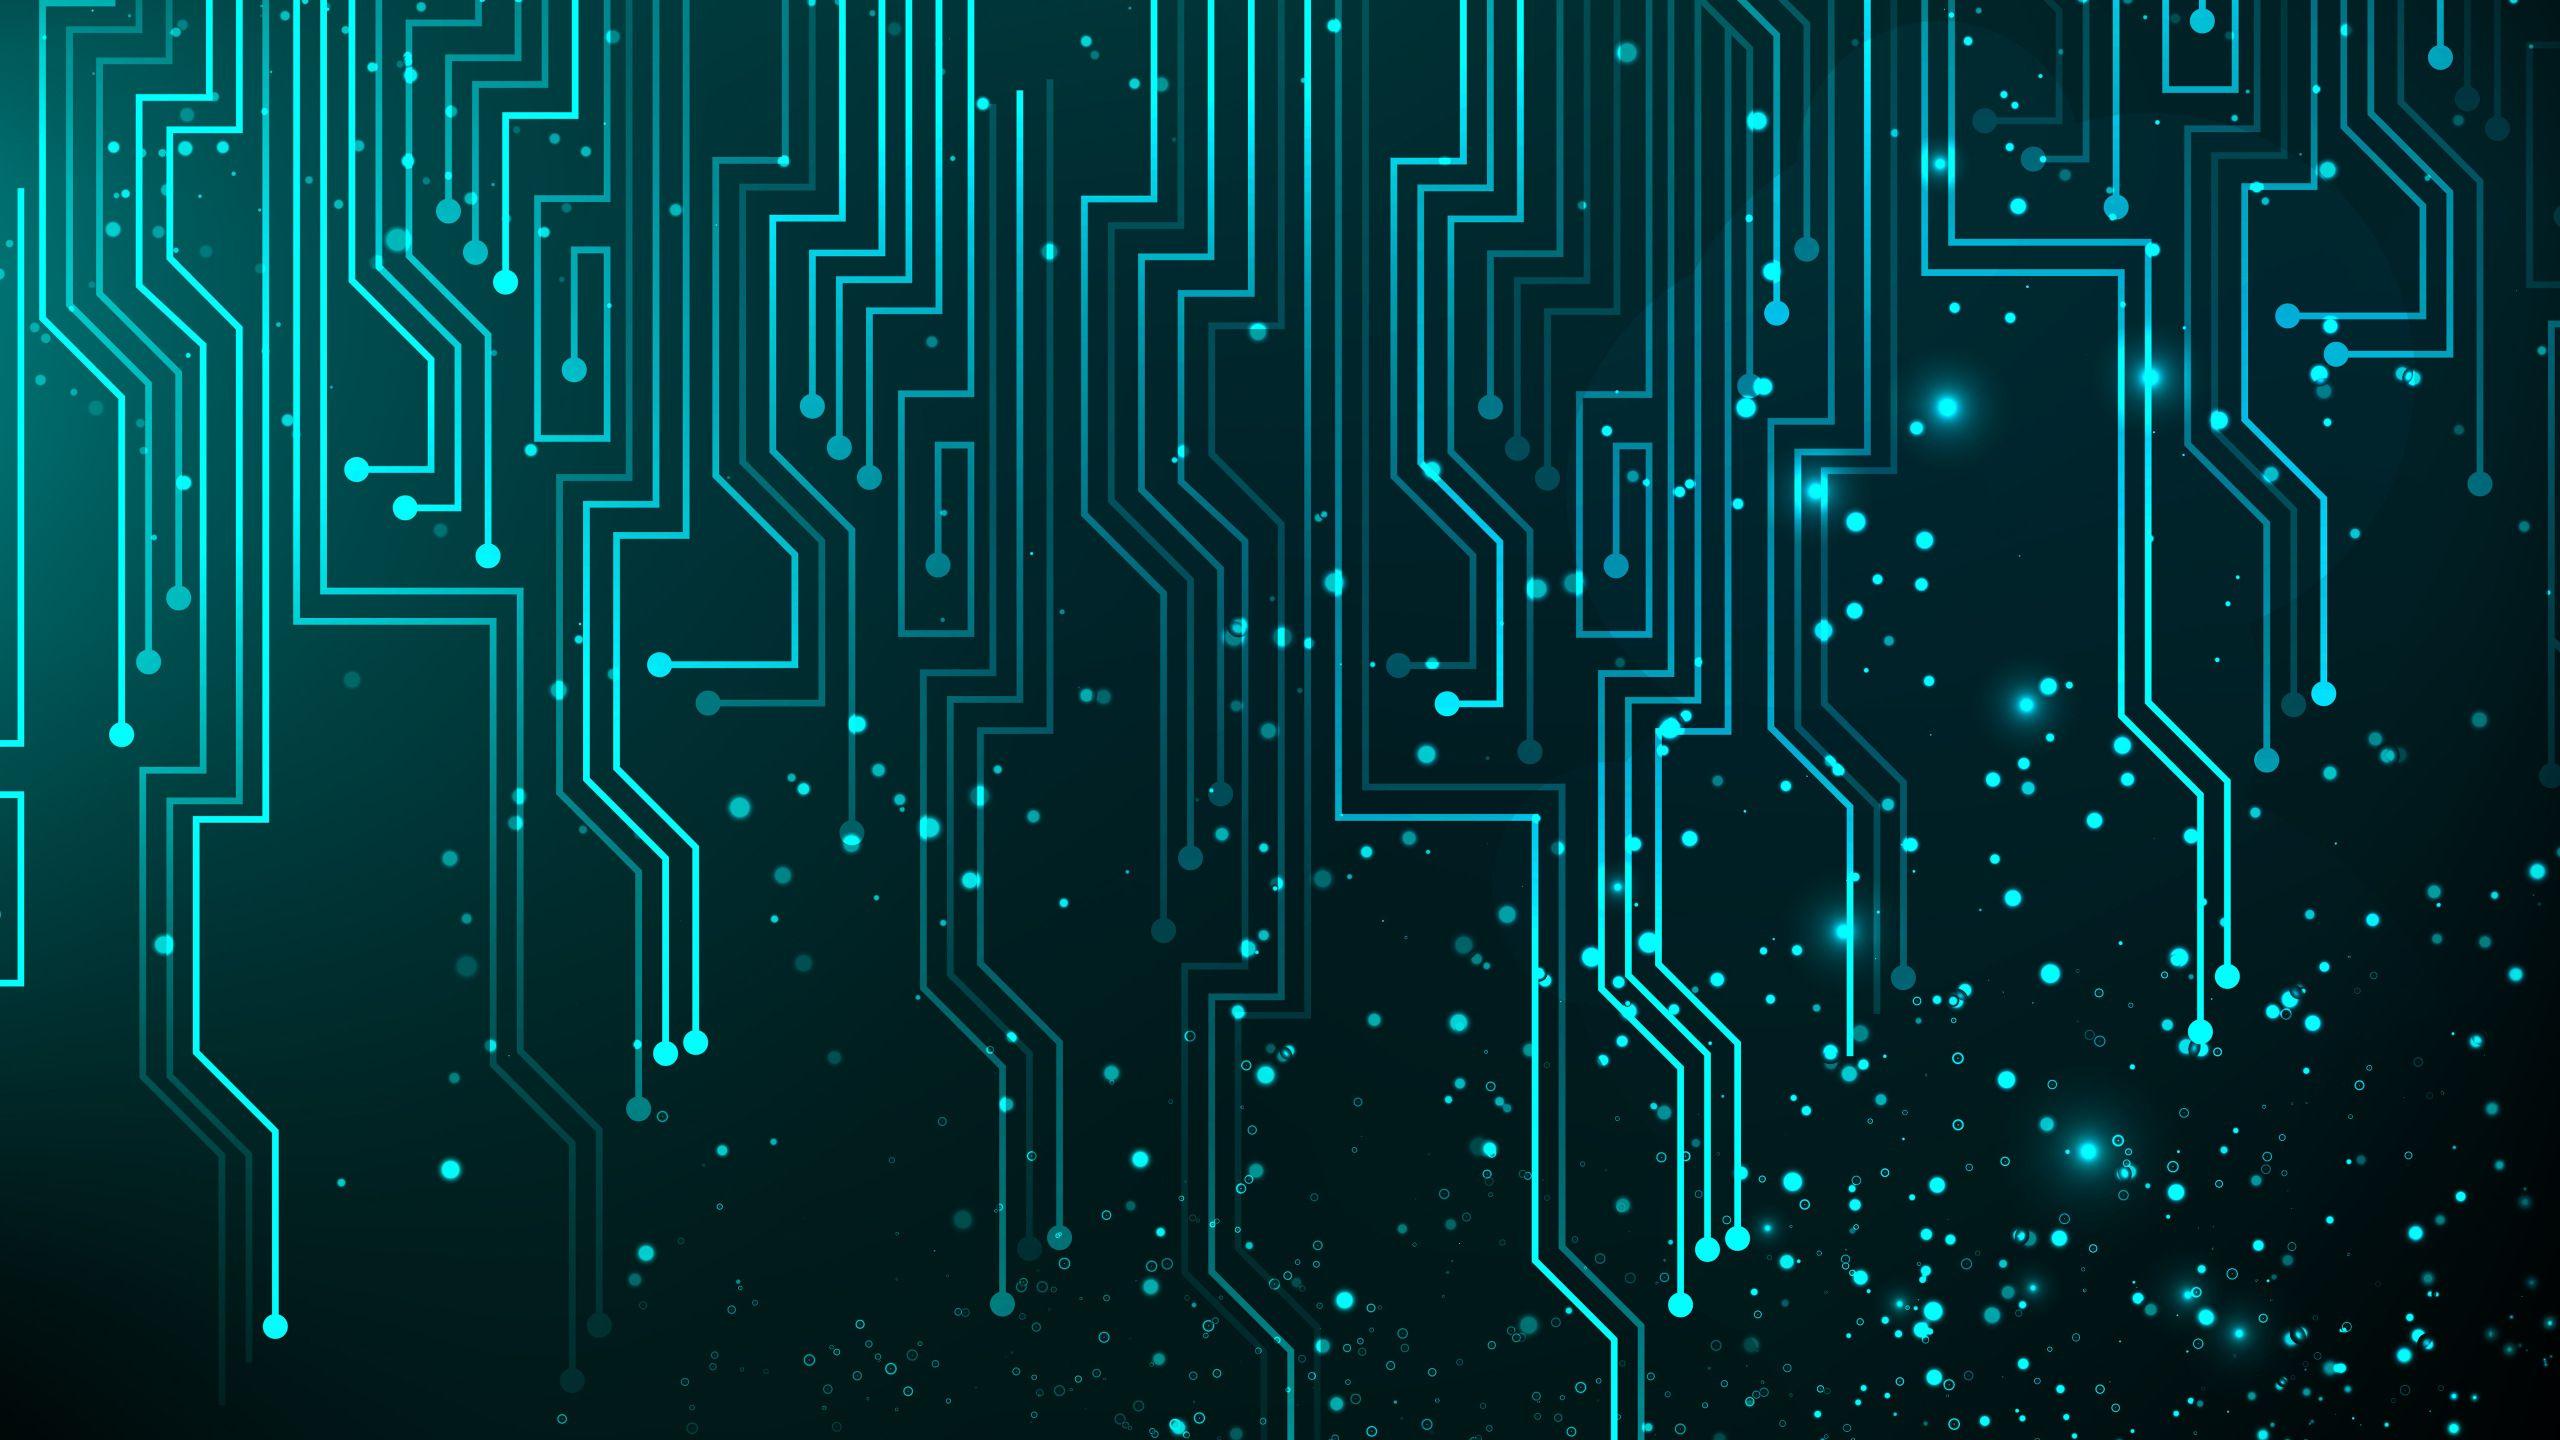 Electronics Wallpaper Posted By John Walker